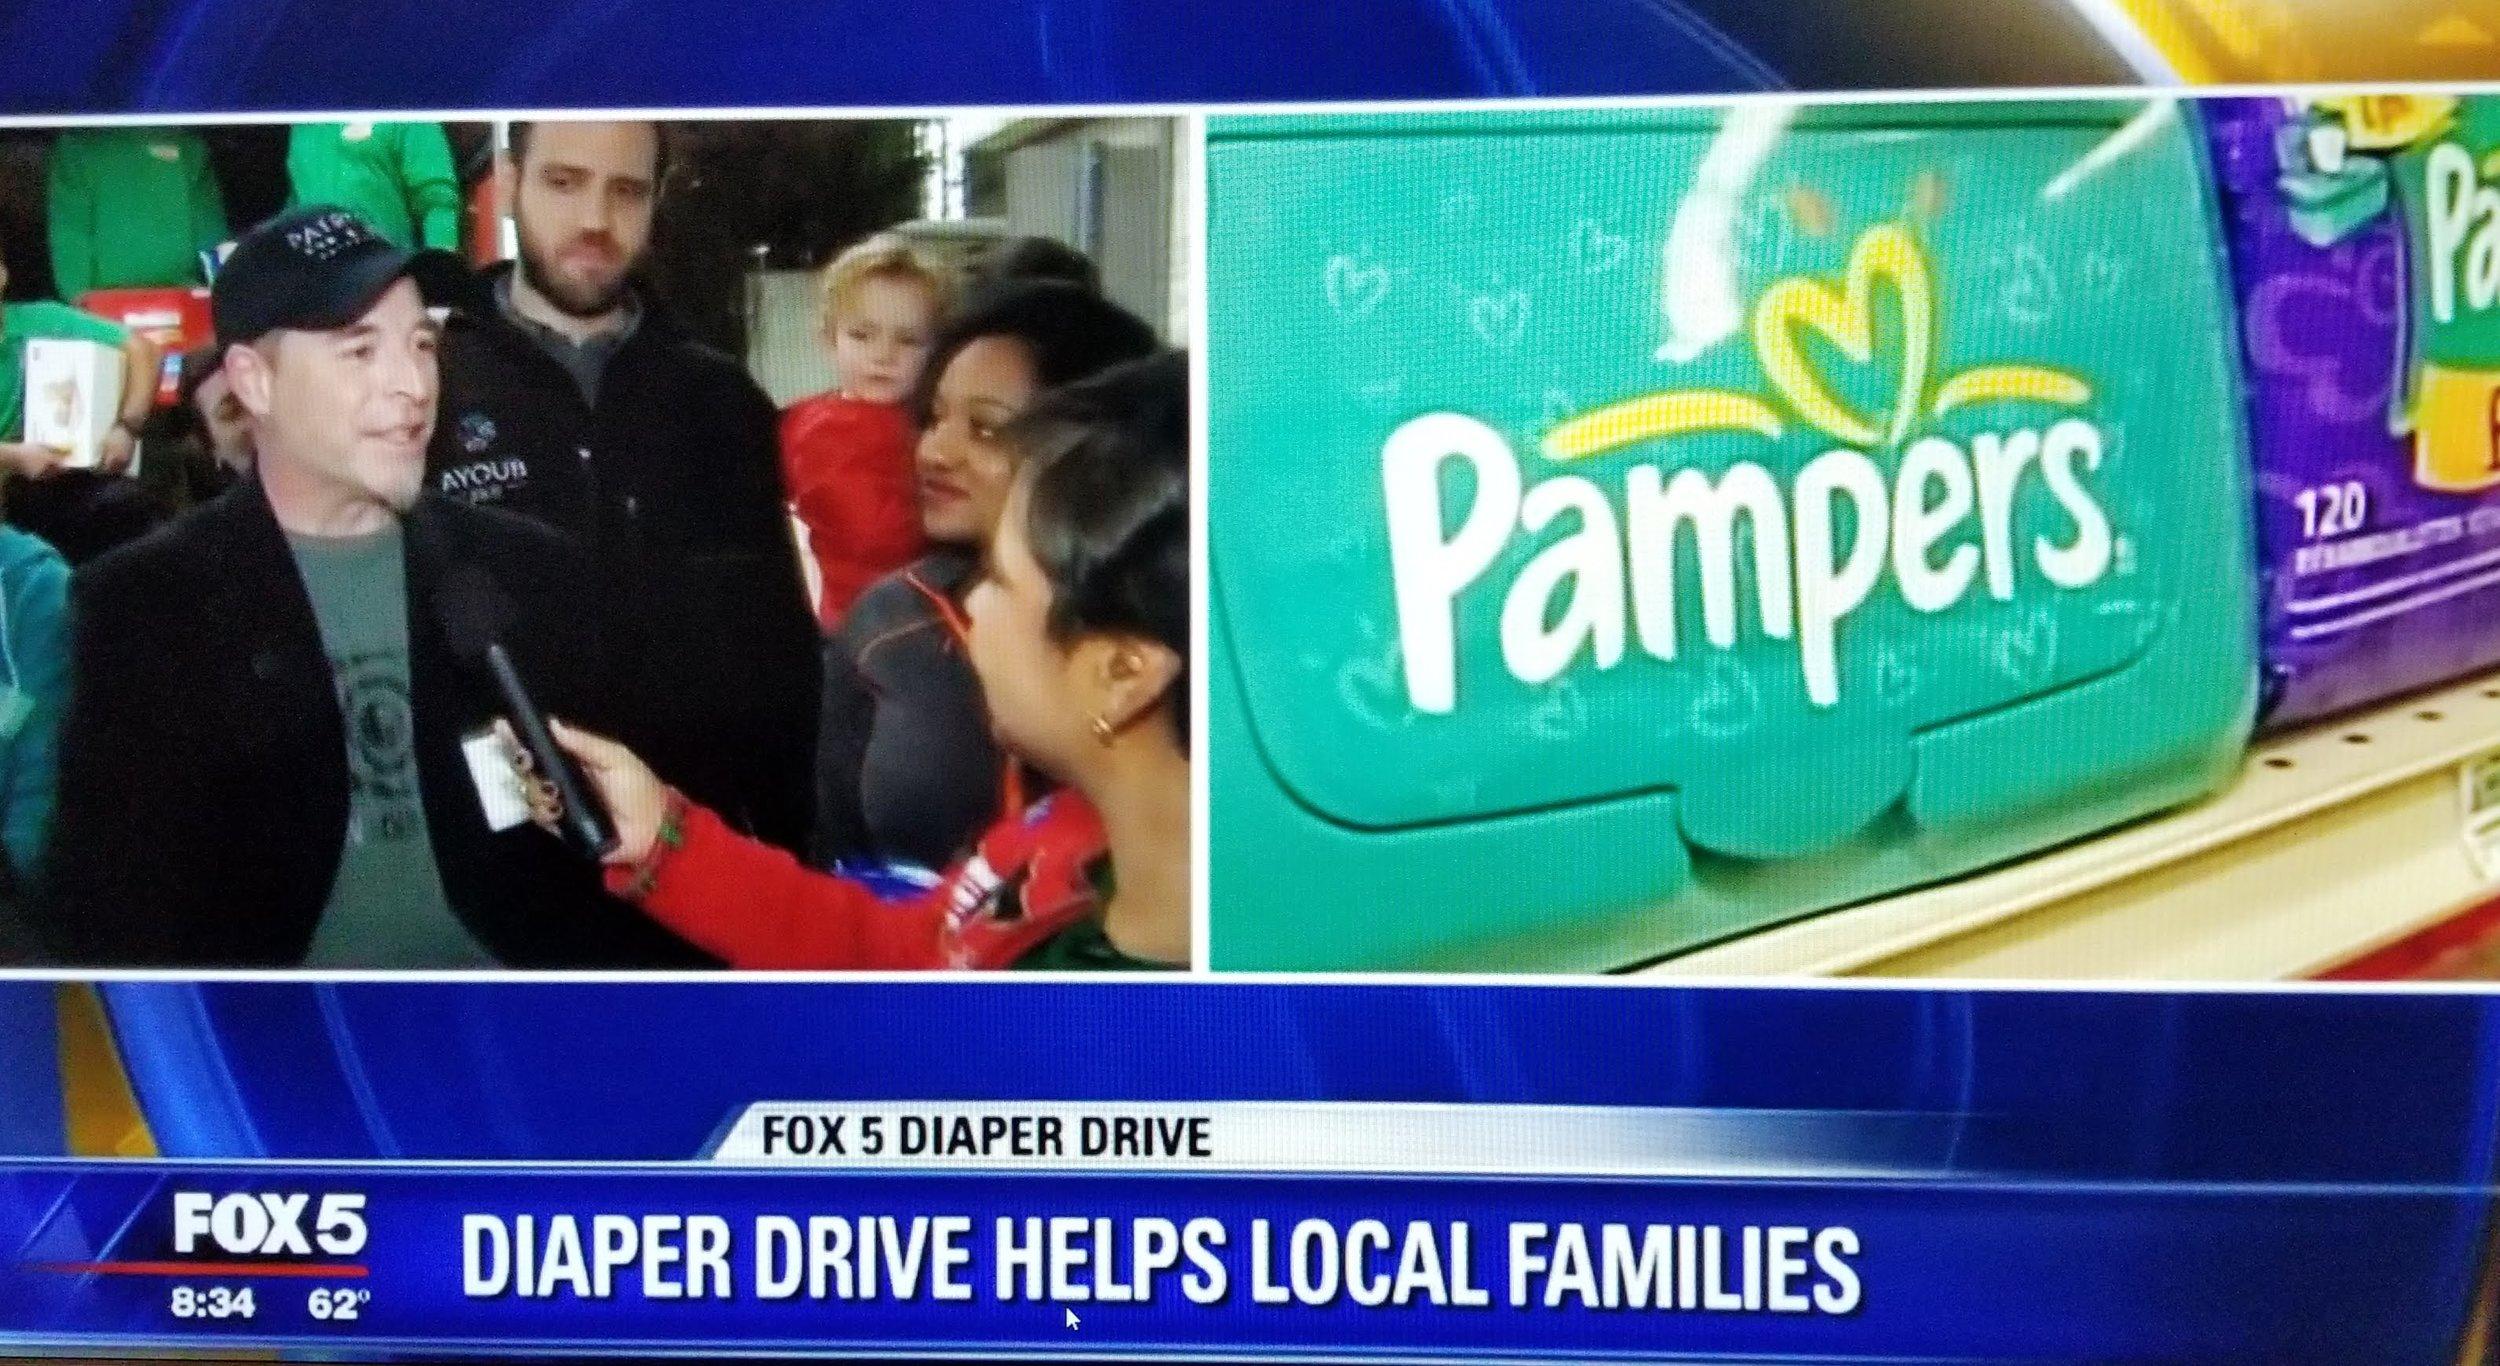 http://www.fox5dc.com/news/pay-it-forward/fox-5-diaper-drive-donation-day